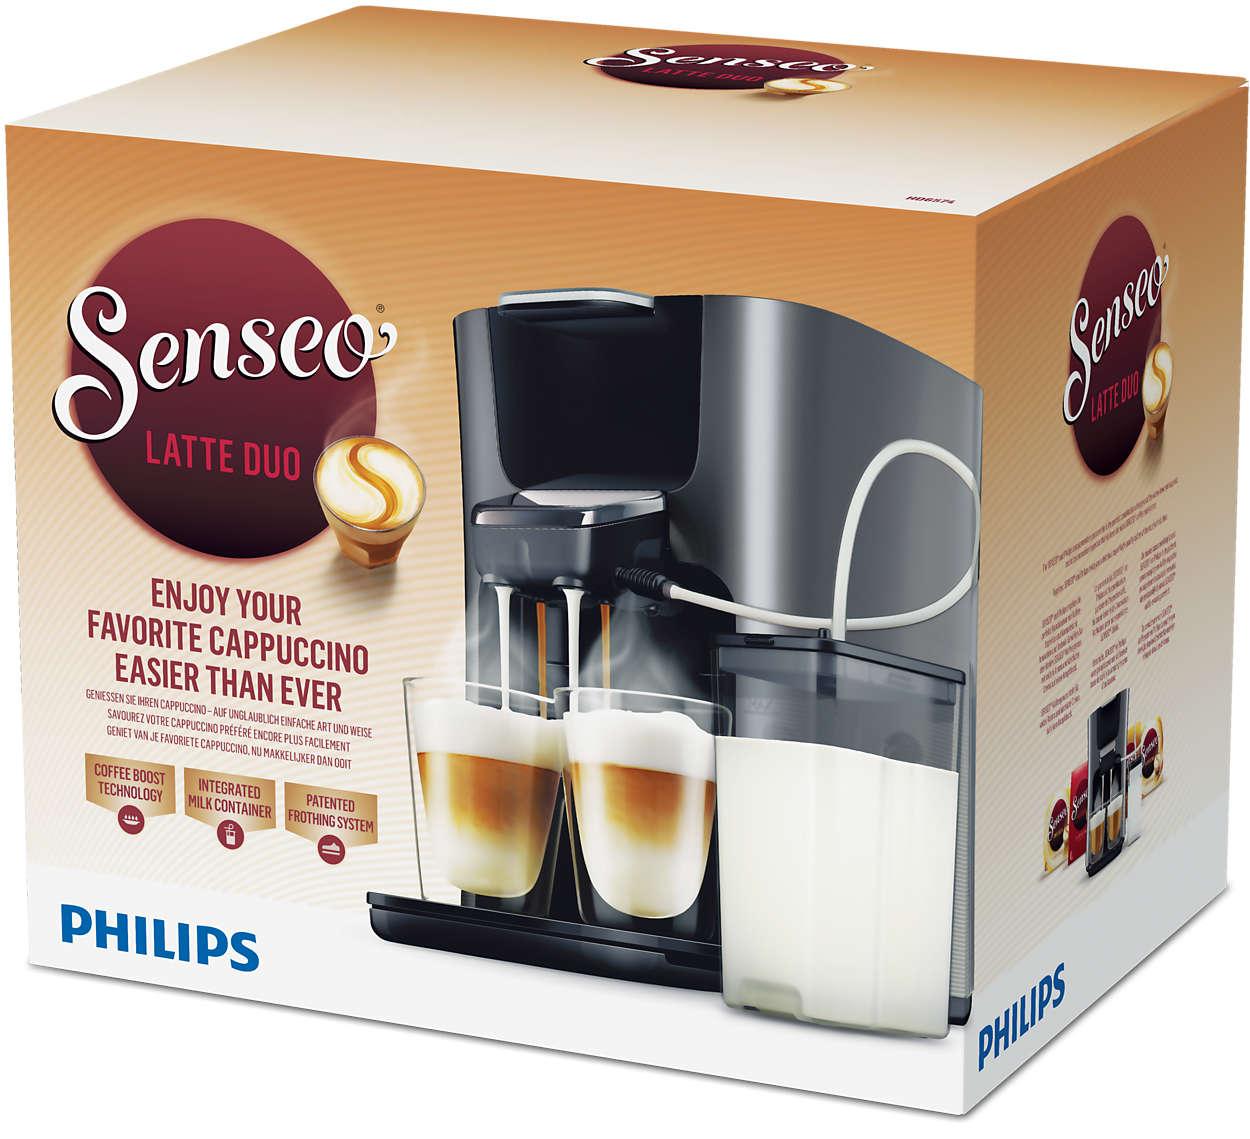 Bedienungsanleitung Philips HD6574 Senseo Latte Duo Plus